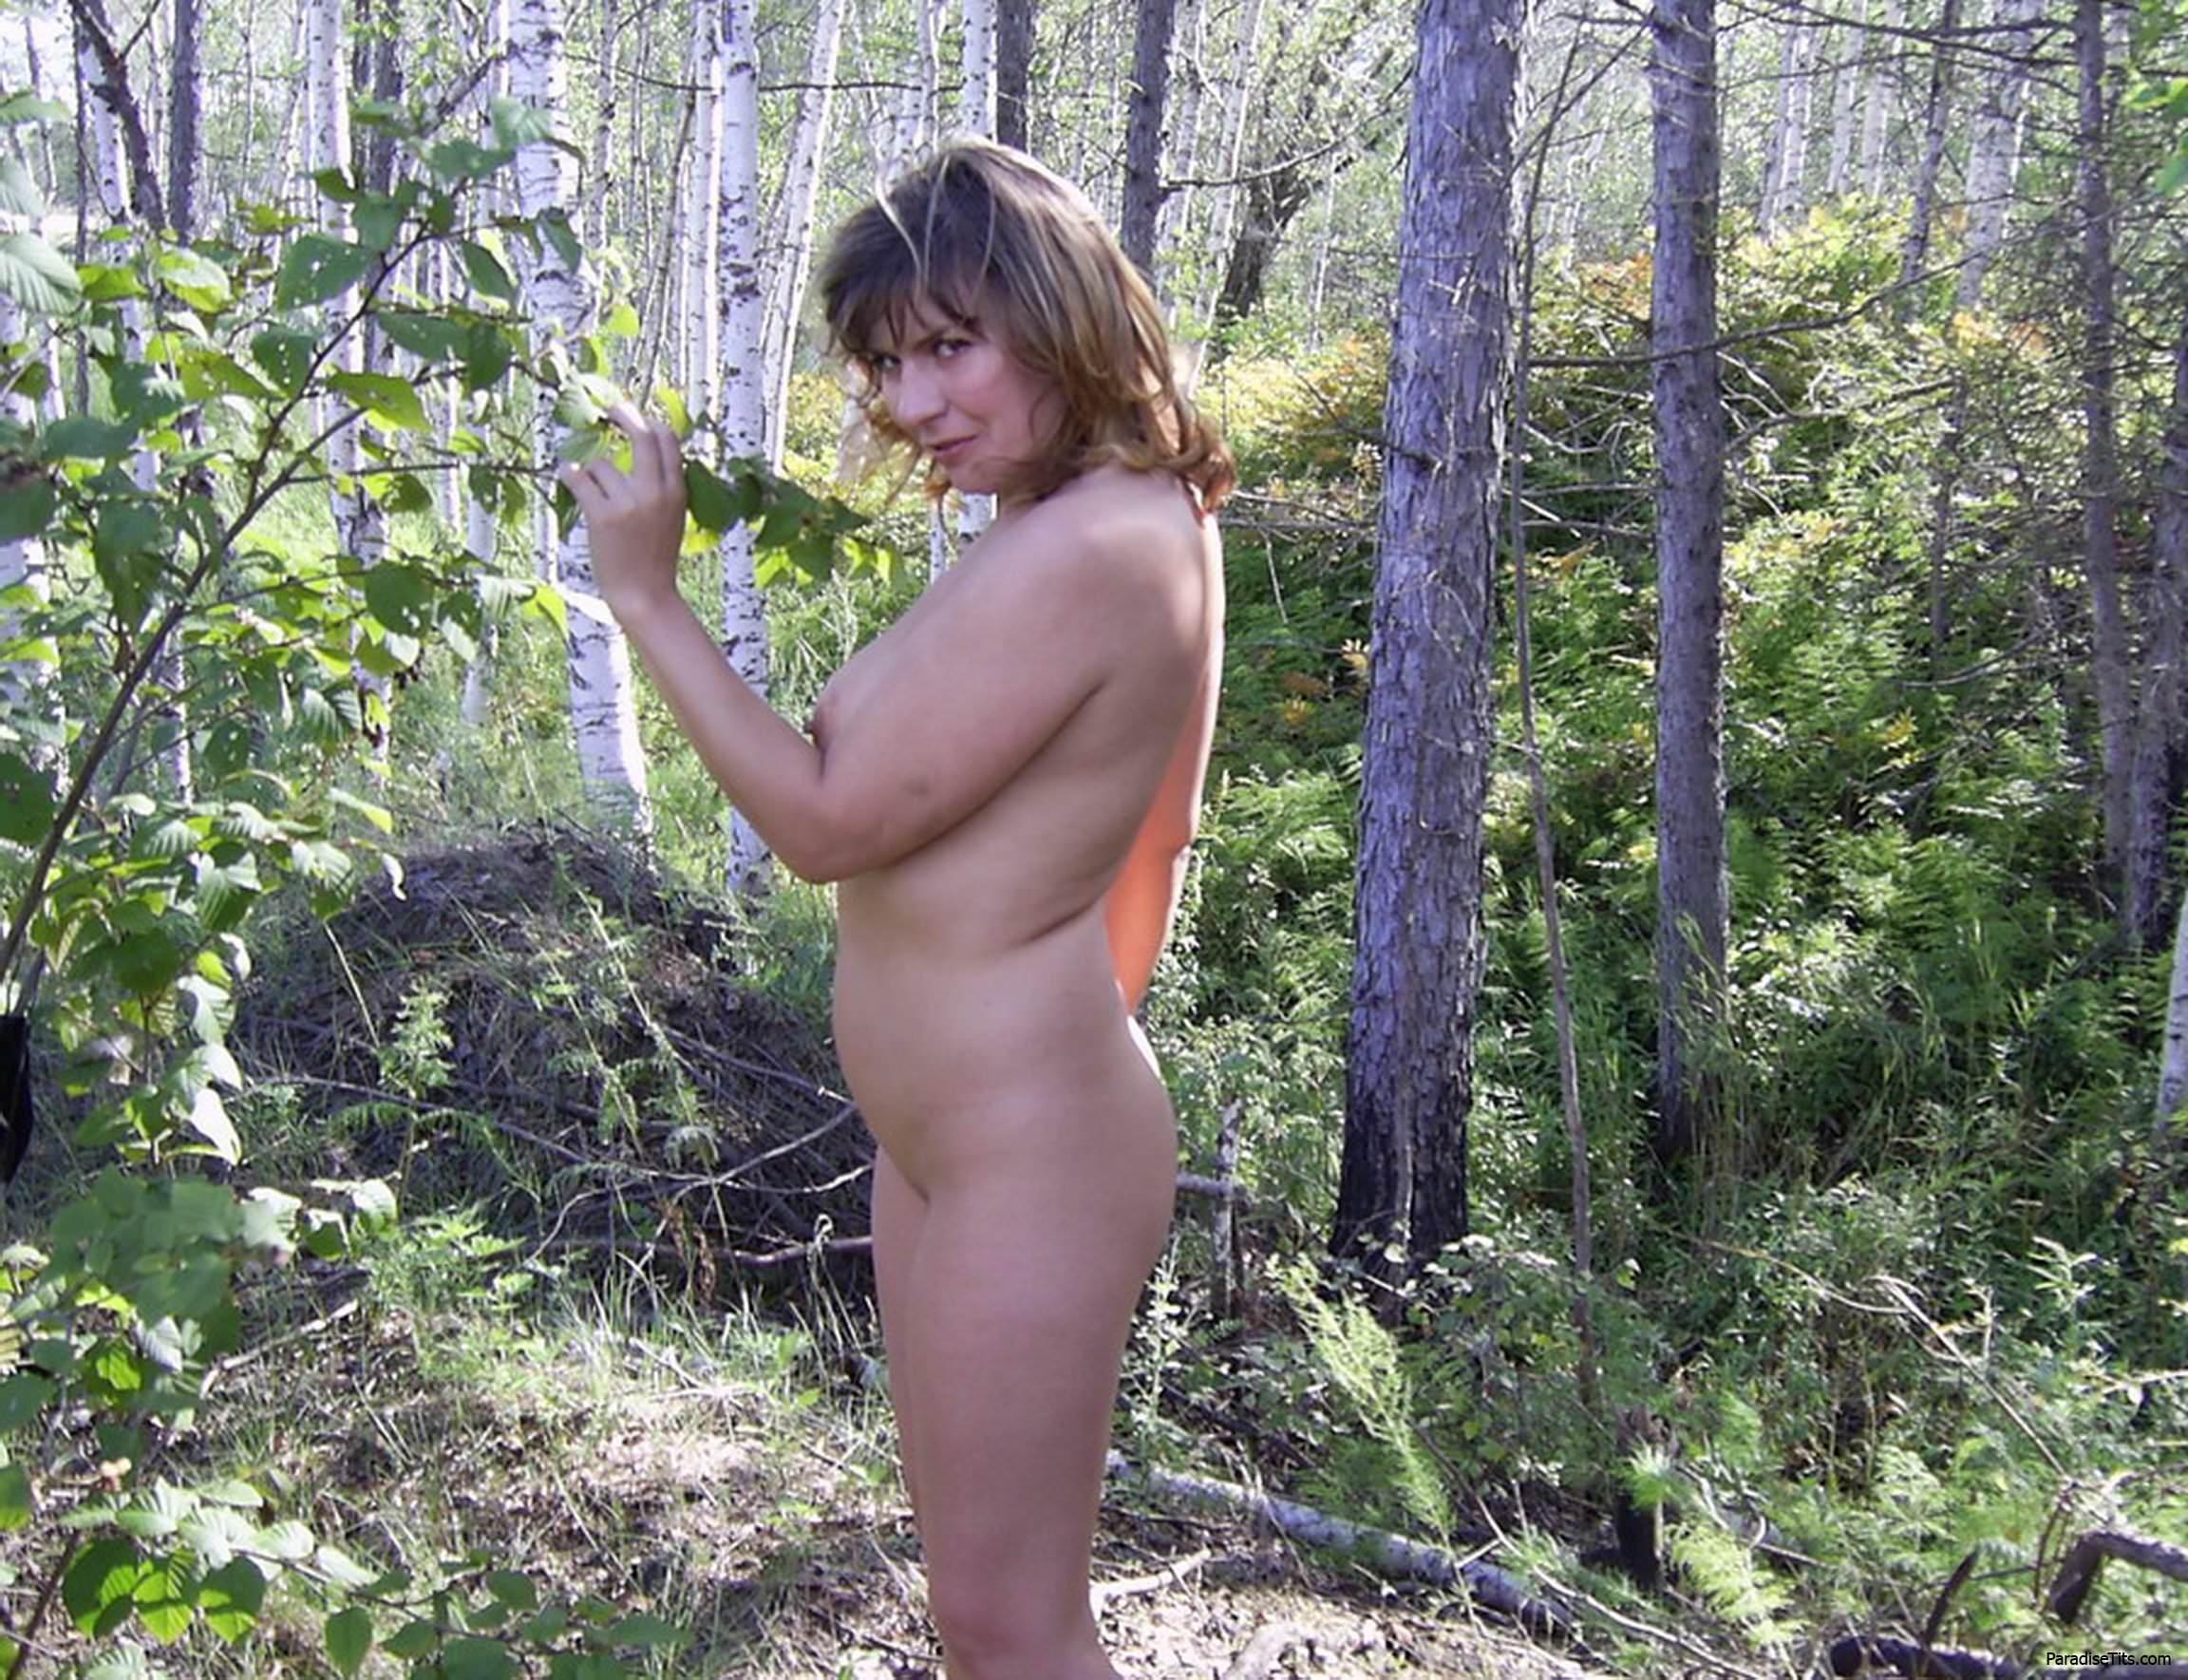 Влесу порнофото фото 389-446